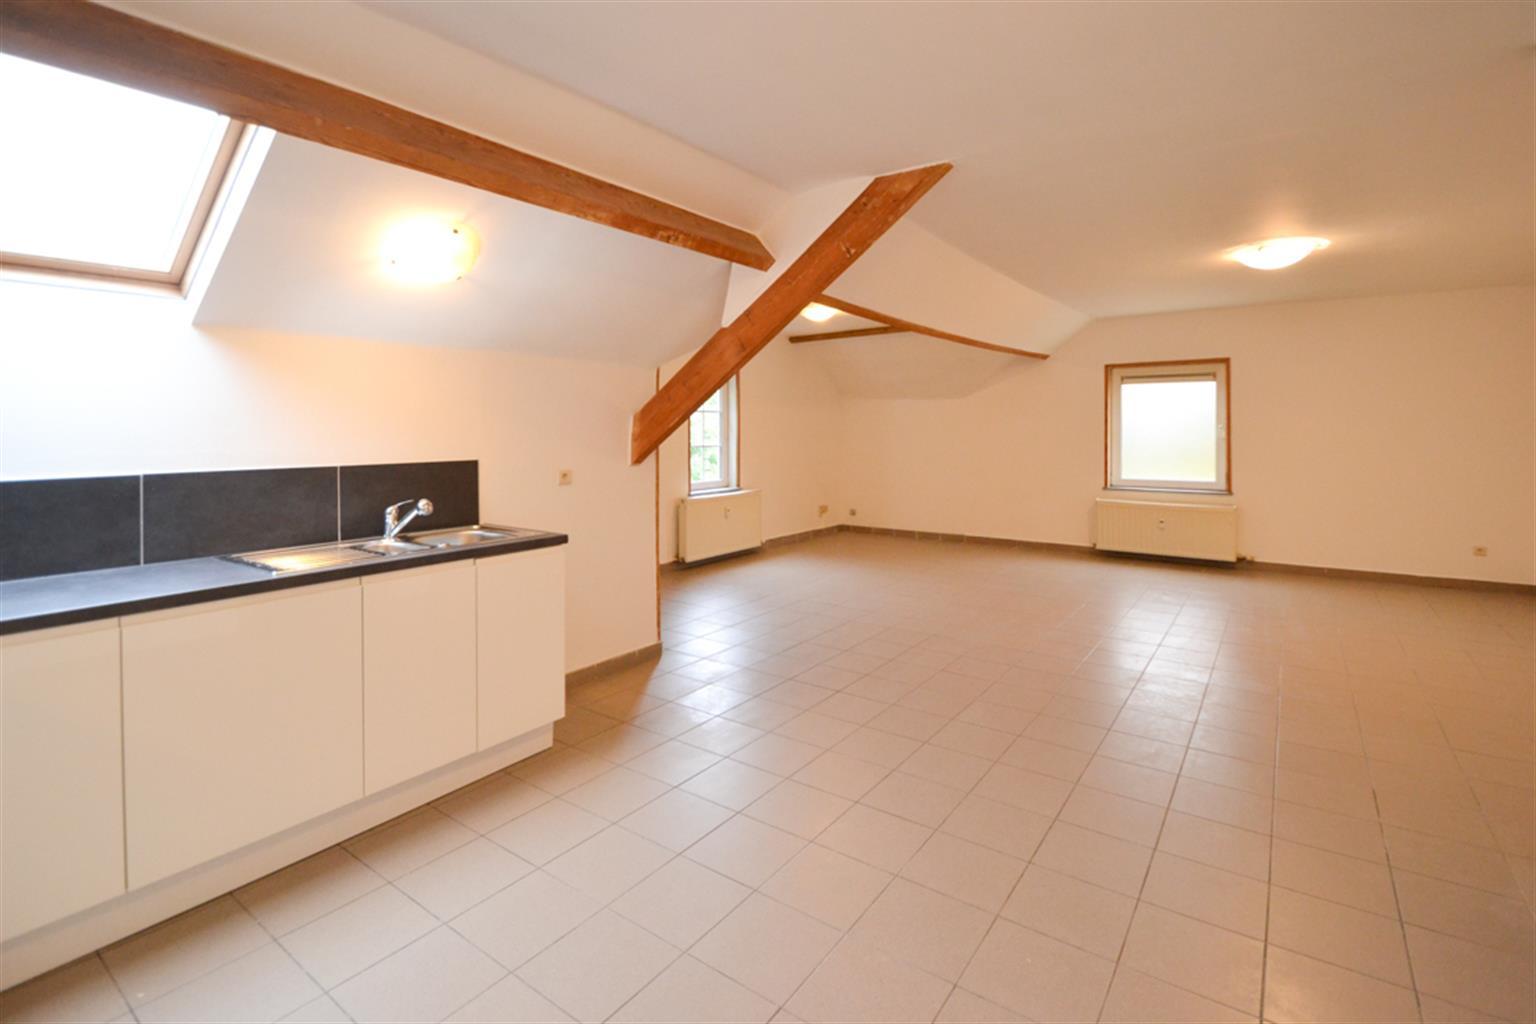 Appartement - Leval-Trahegnies - #3703787-2